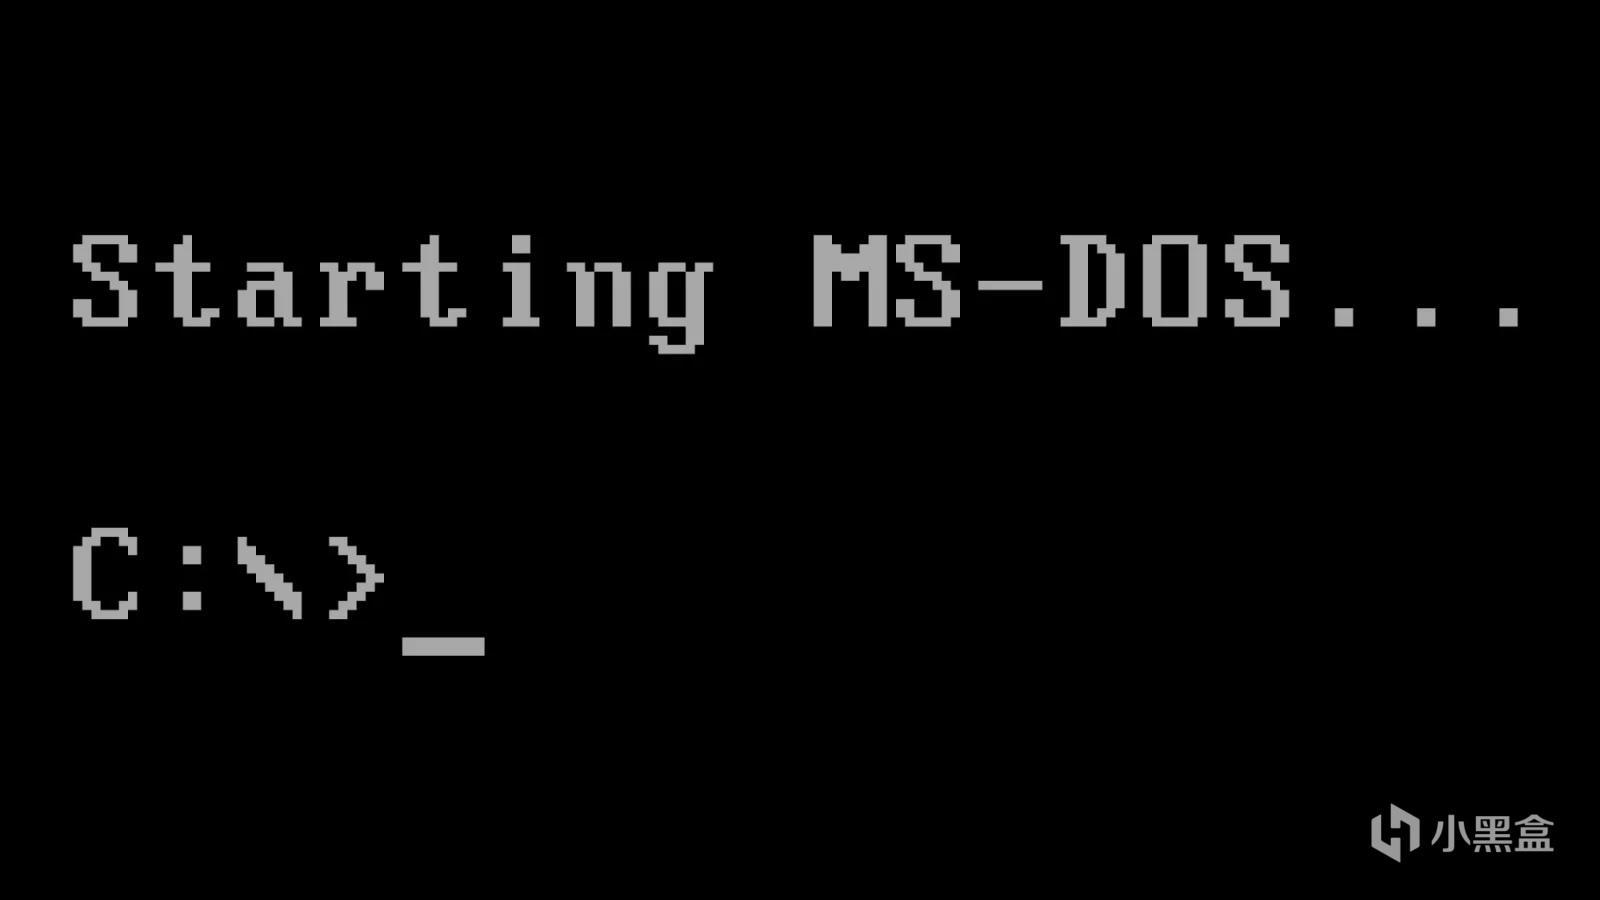 MS-DOS系统界面